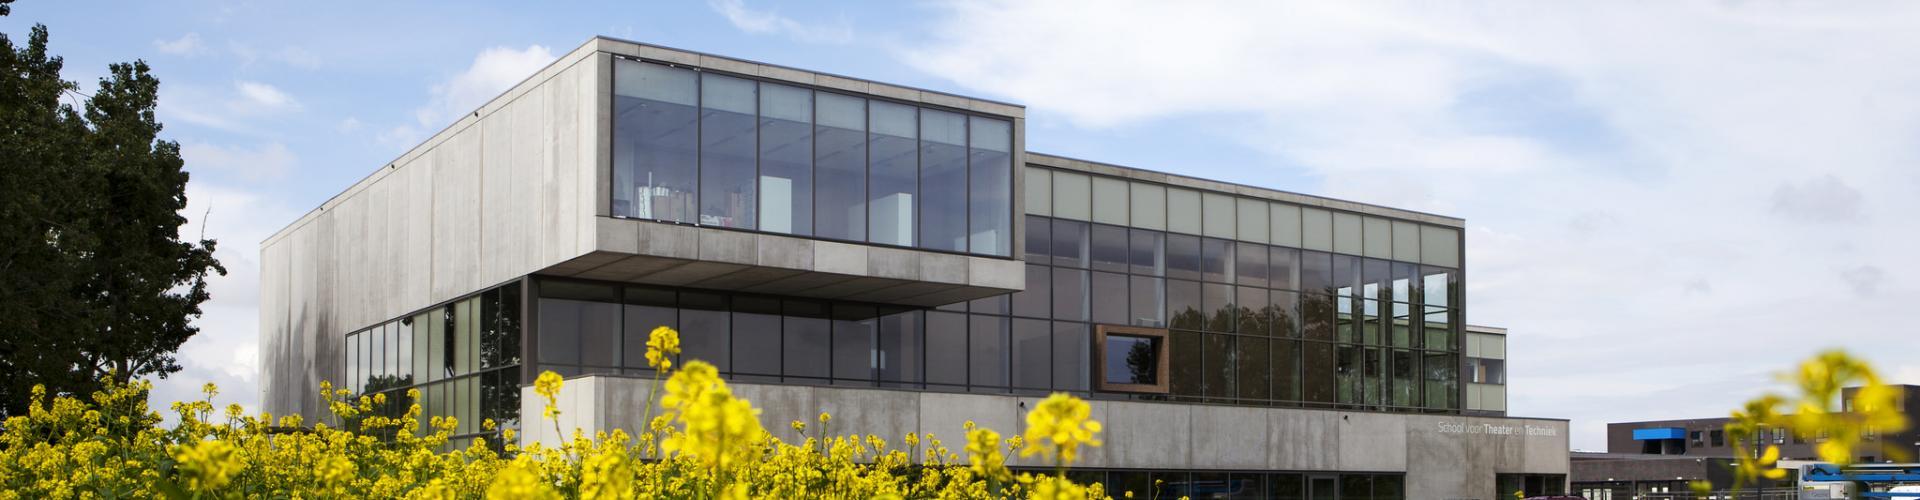 Campus Ter Zee Oostende